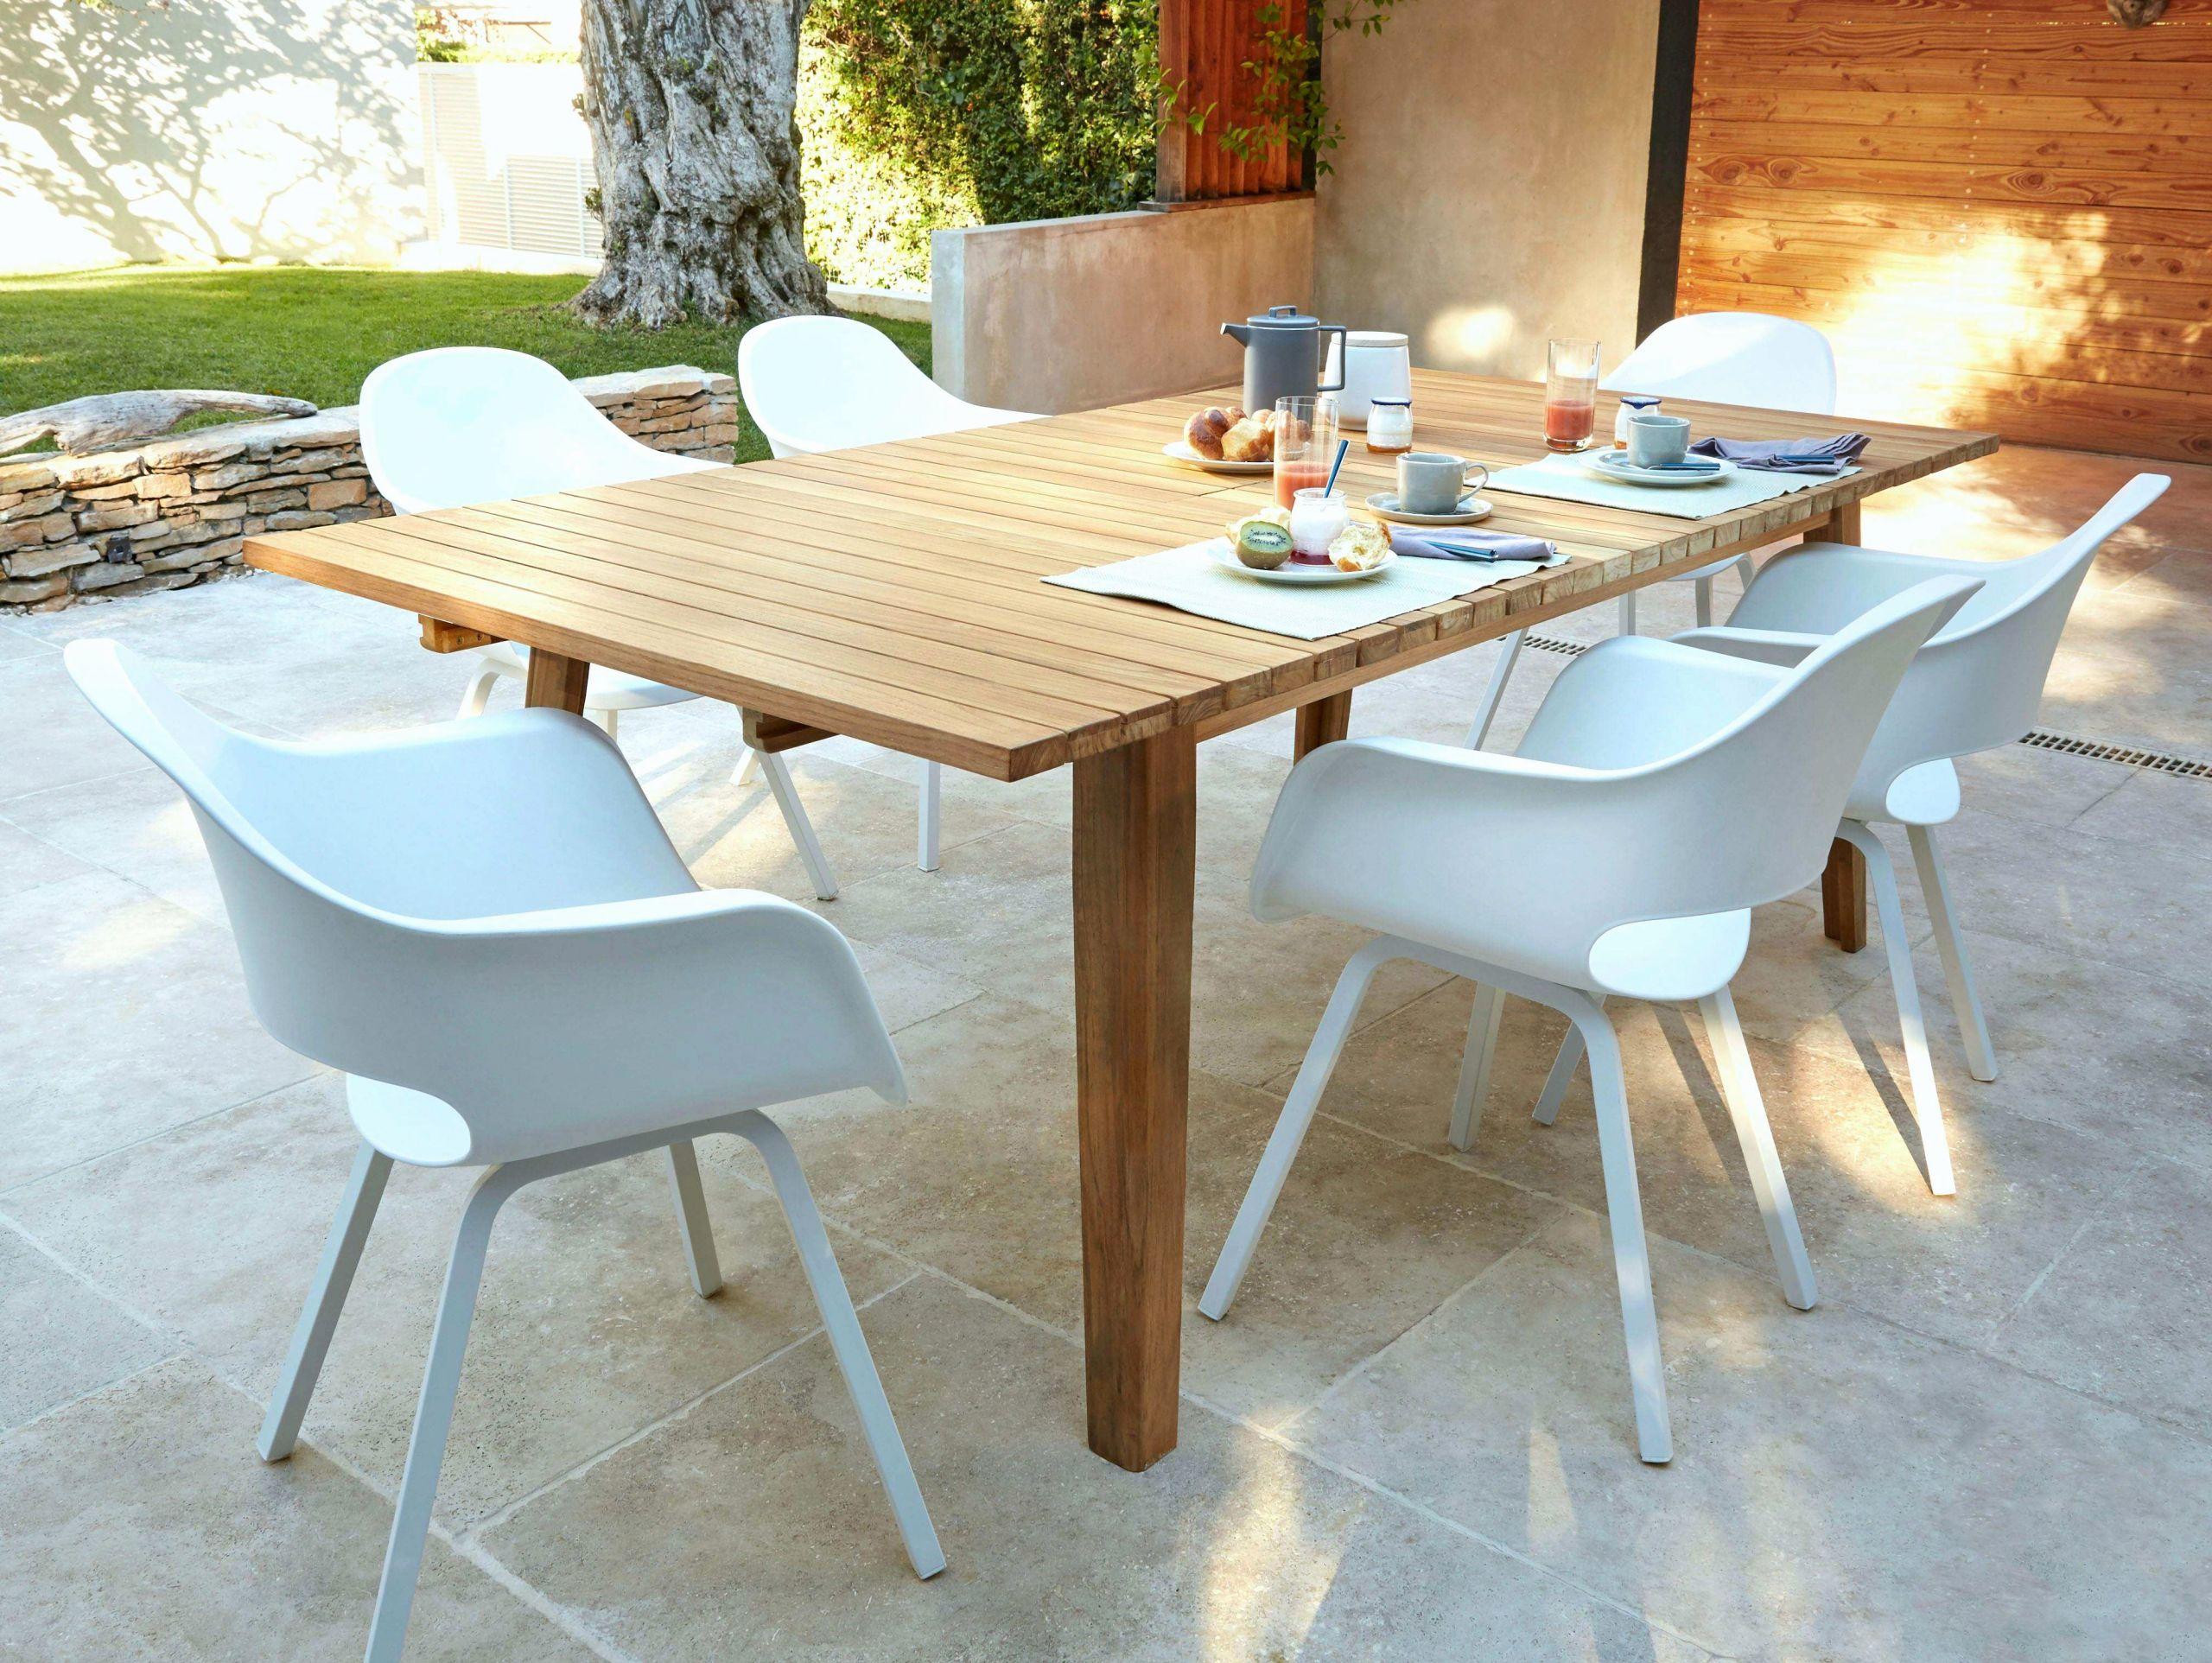 leroy merlin terrasse et jardin frais chaise jardin leroy merlin impressionnant le roy merlin jardin of leroy merlin terrasse et jardin